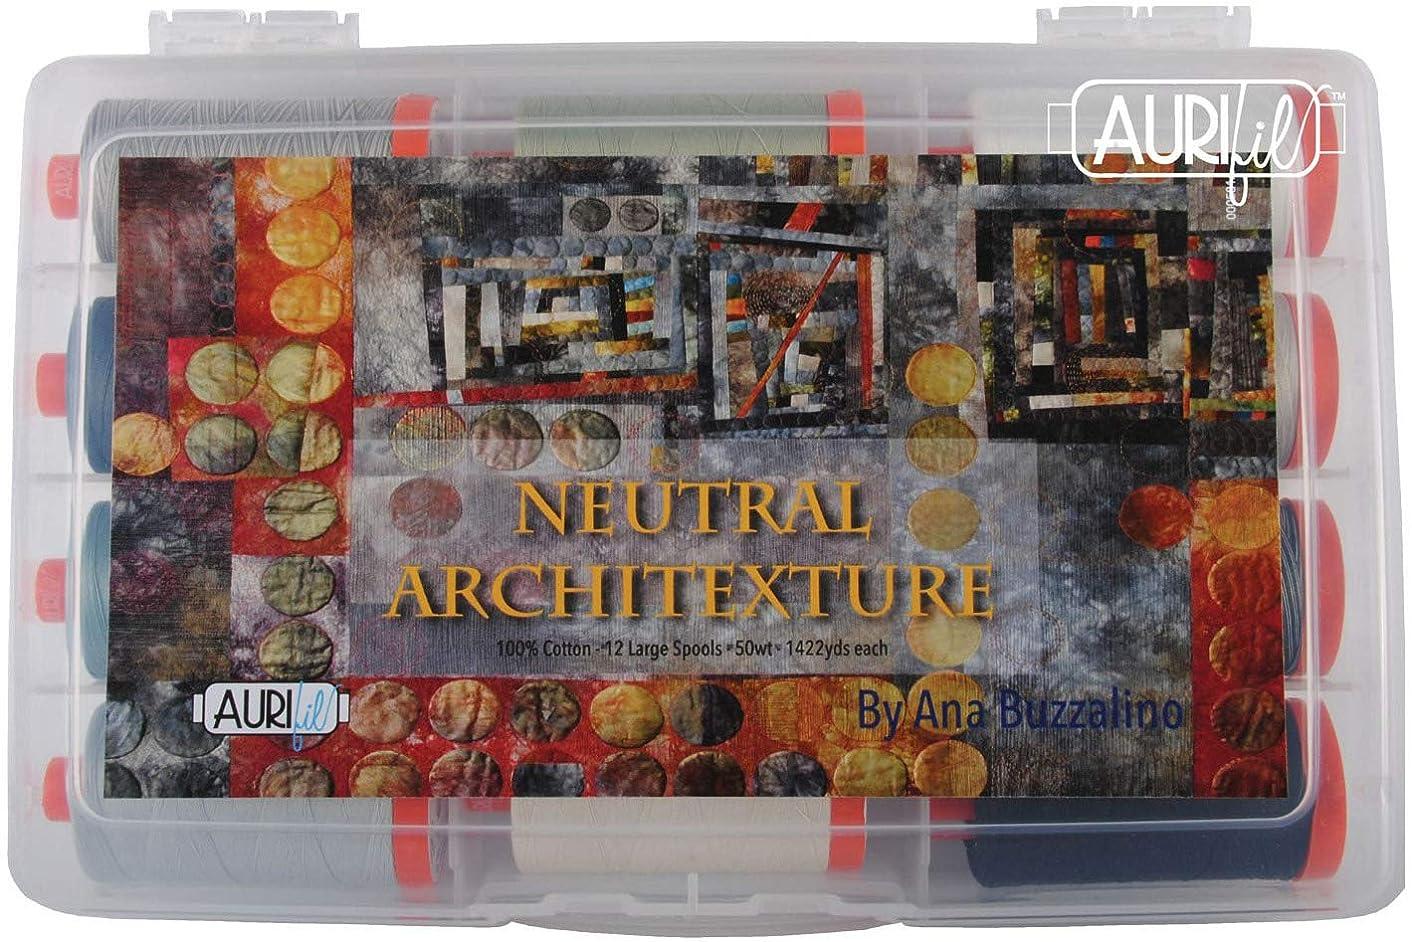 Ana Buzzalino Neutral Architexture Aurifil Thread Kit 12 Large Spools 50 Weight AB50NA12